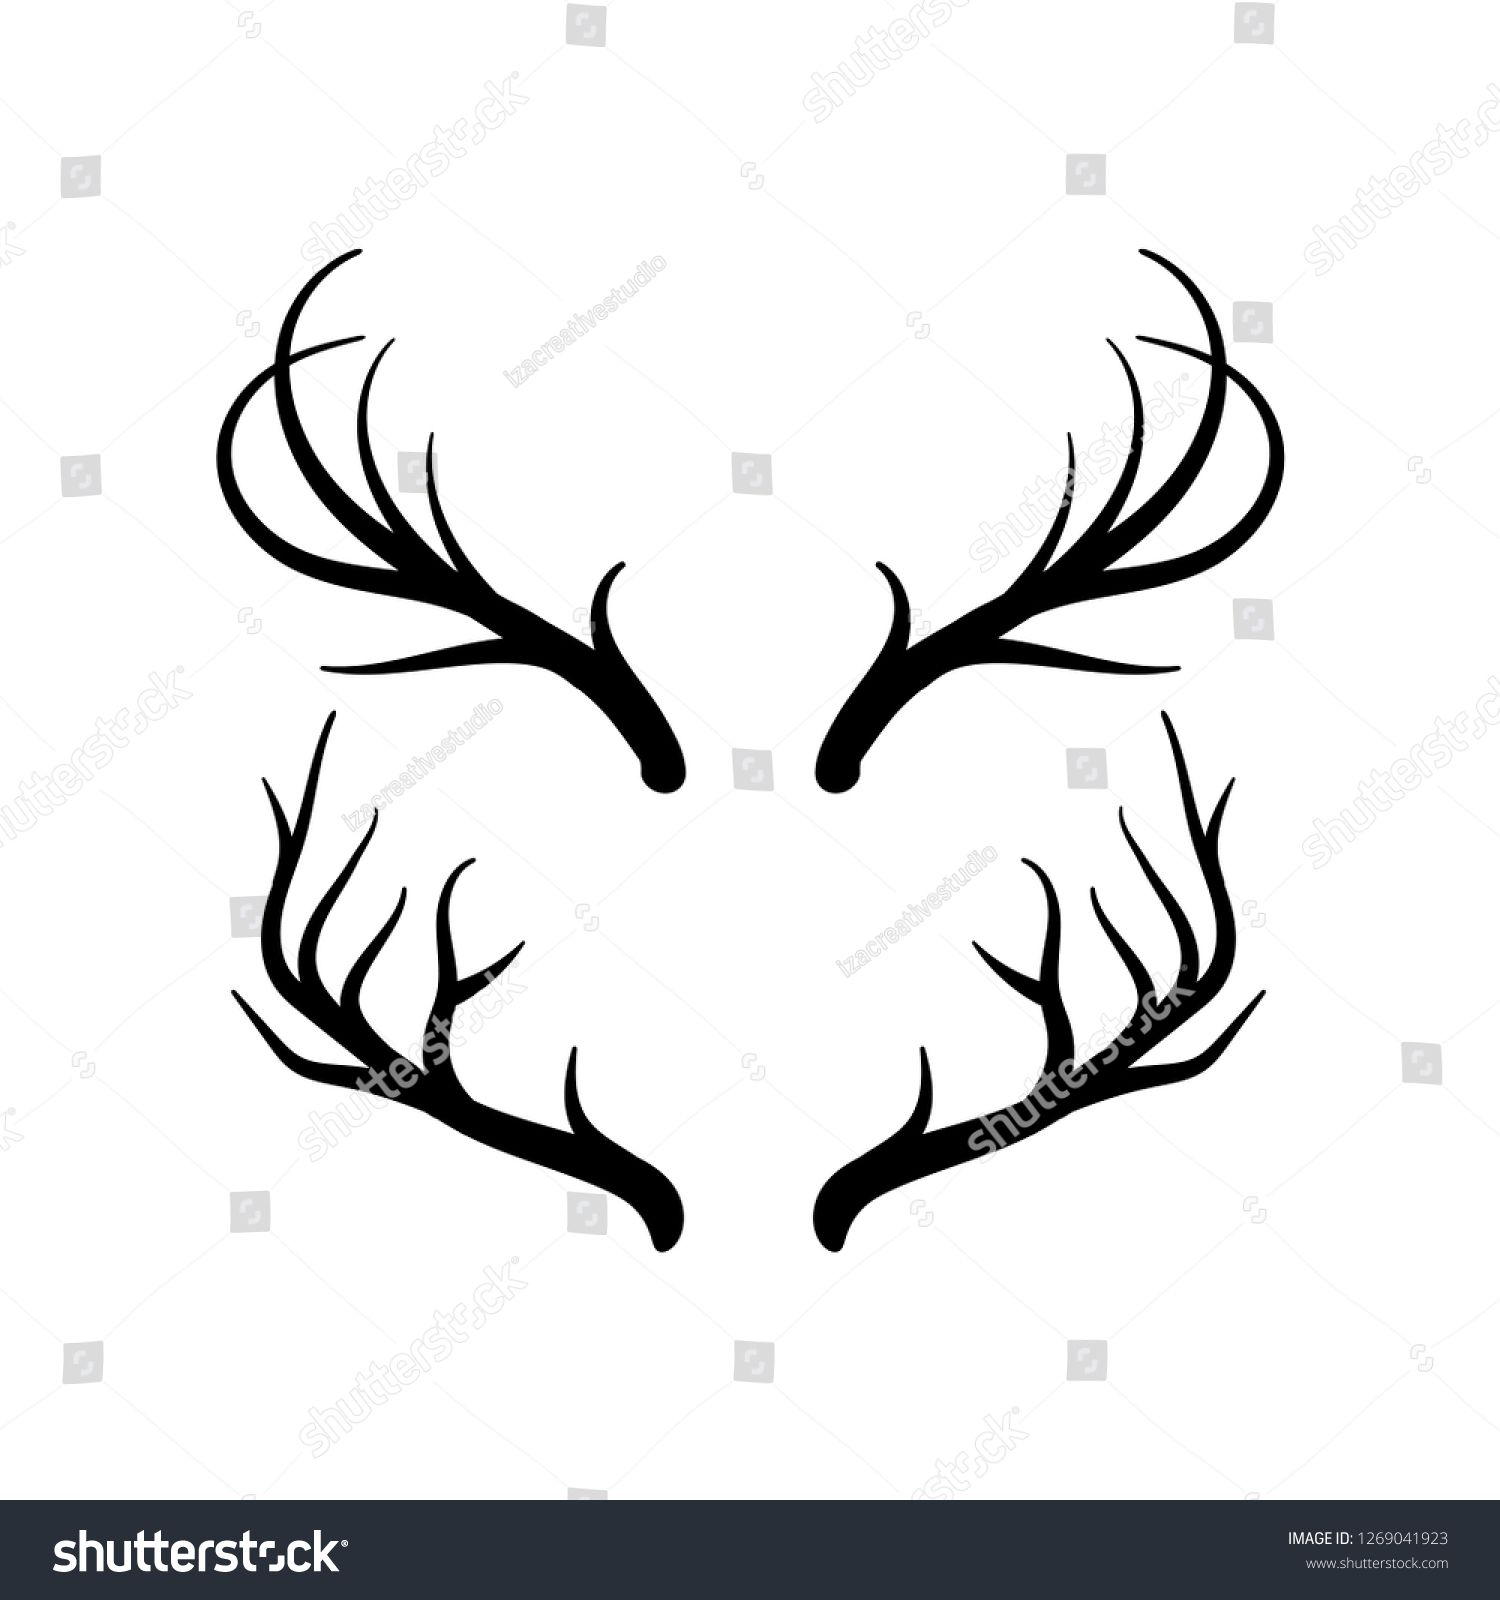 Pin by Vinh Phương on Horn Vector icons, Deer horns